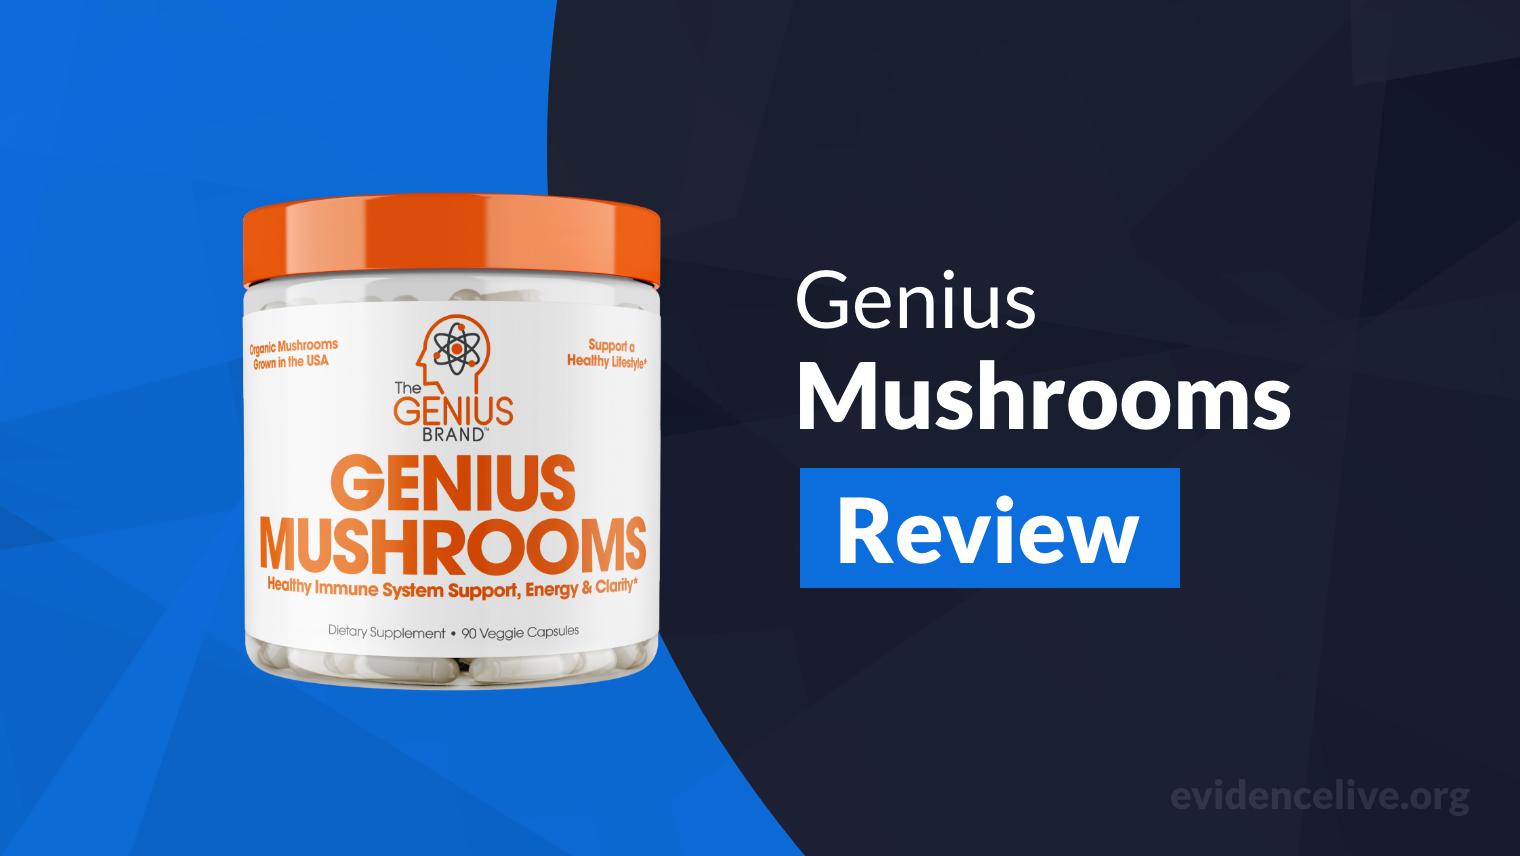 Genius Mushrooms Review: Is It Worth It?